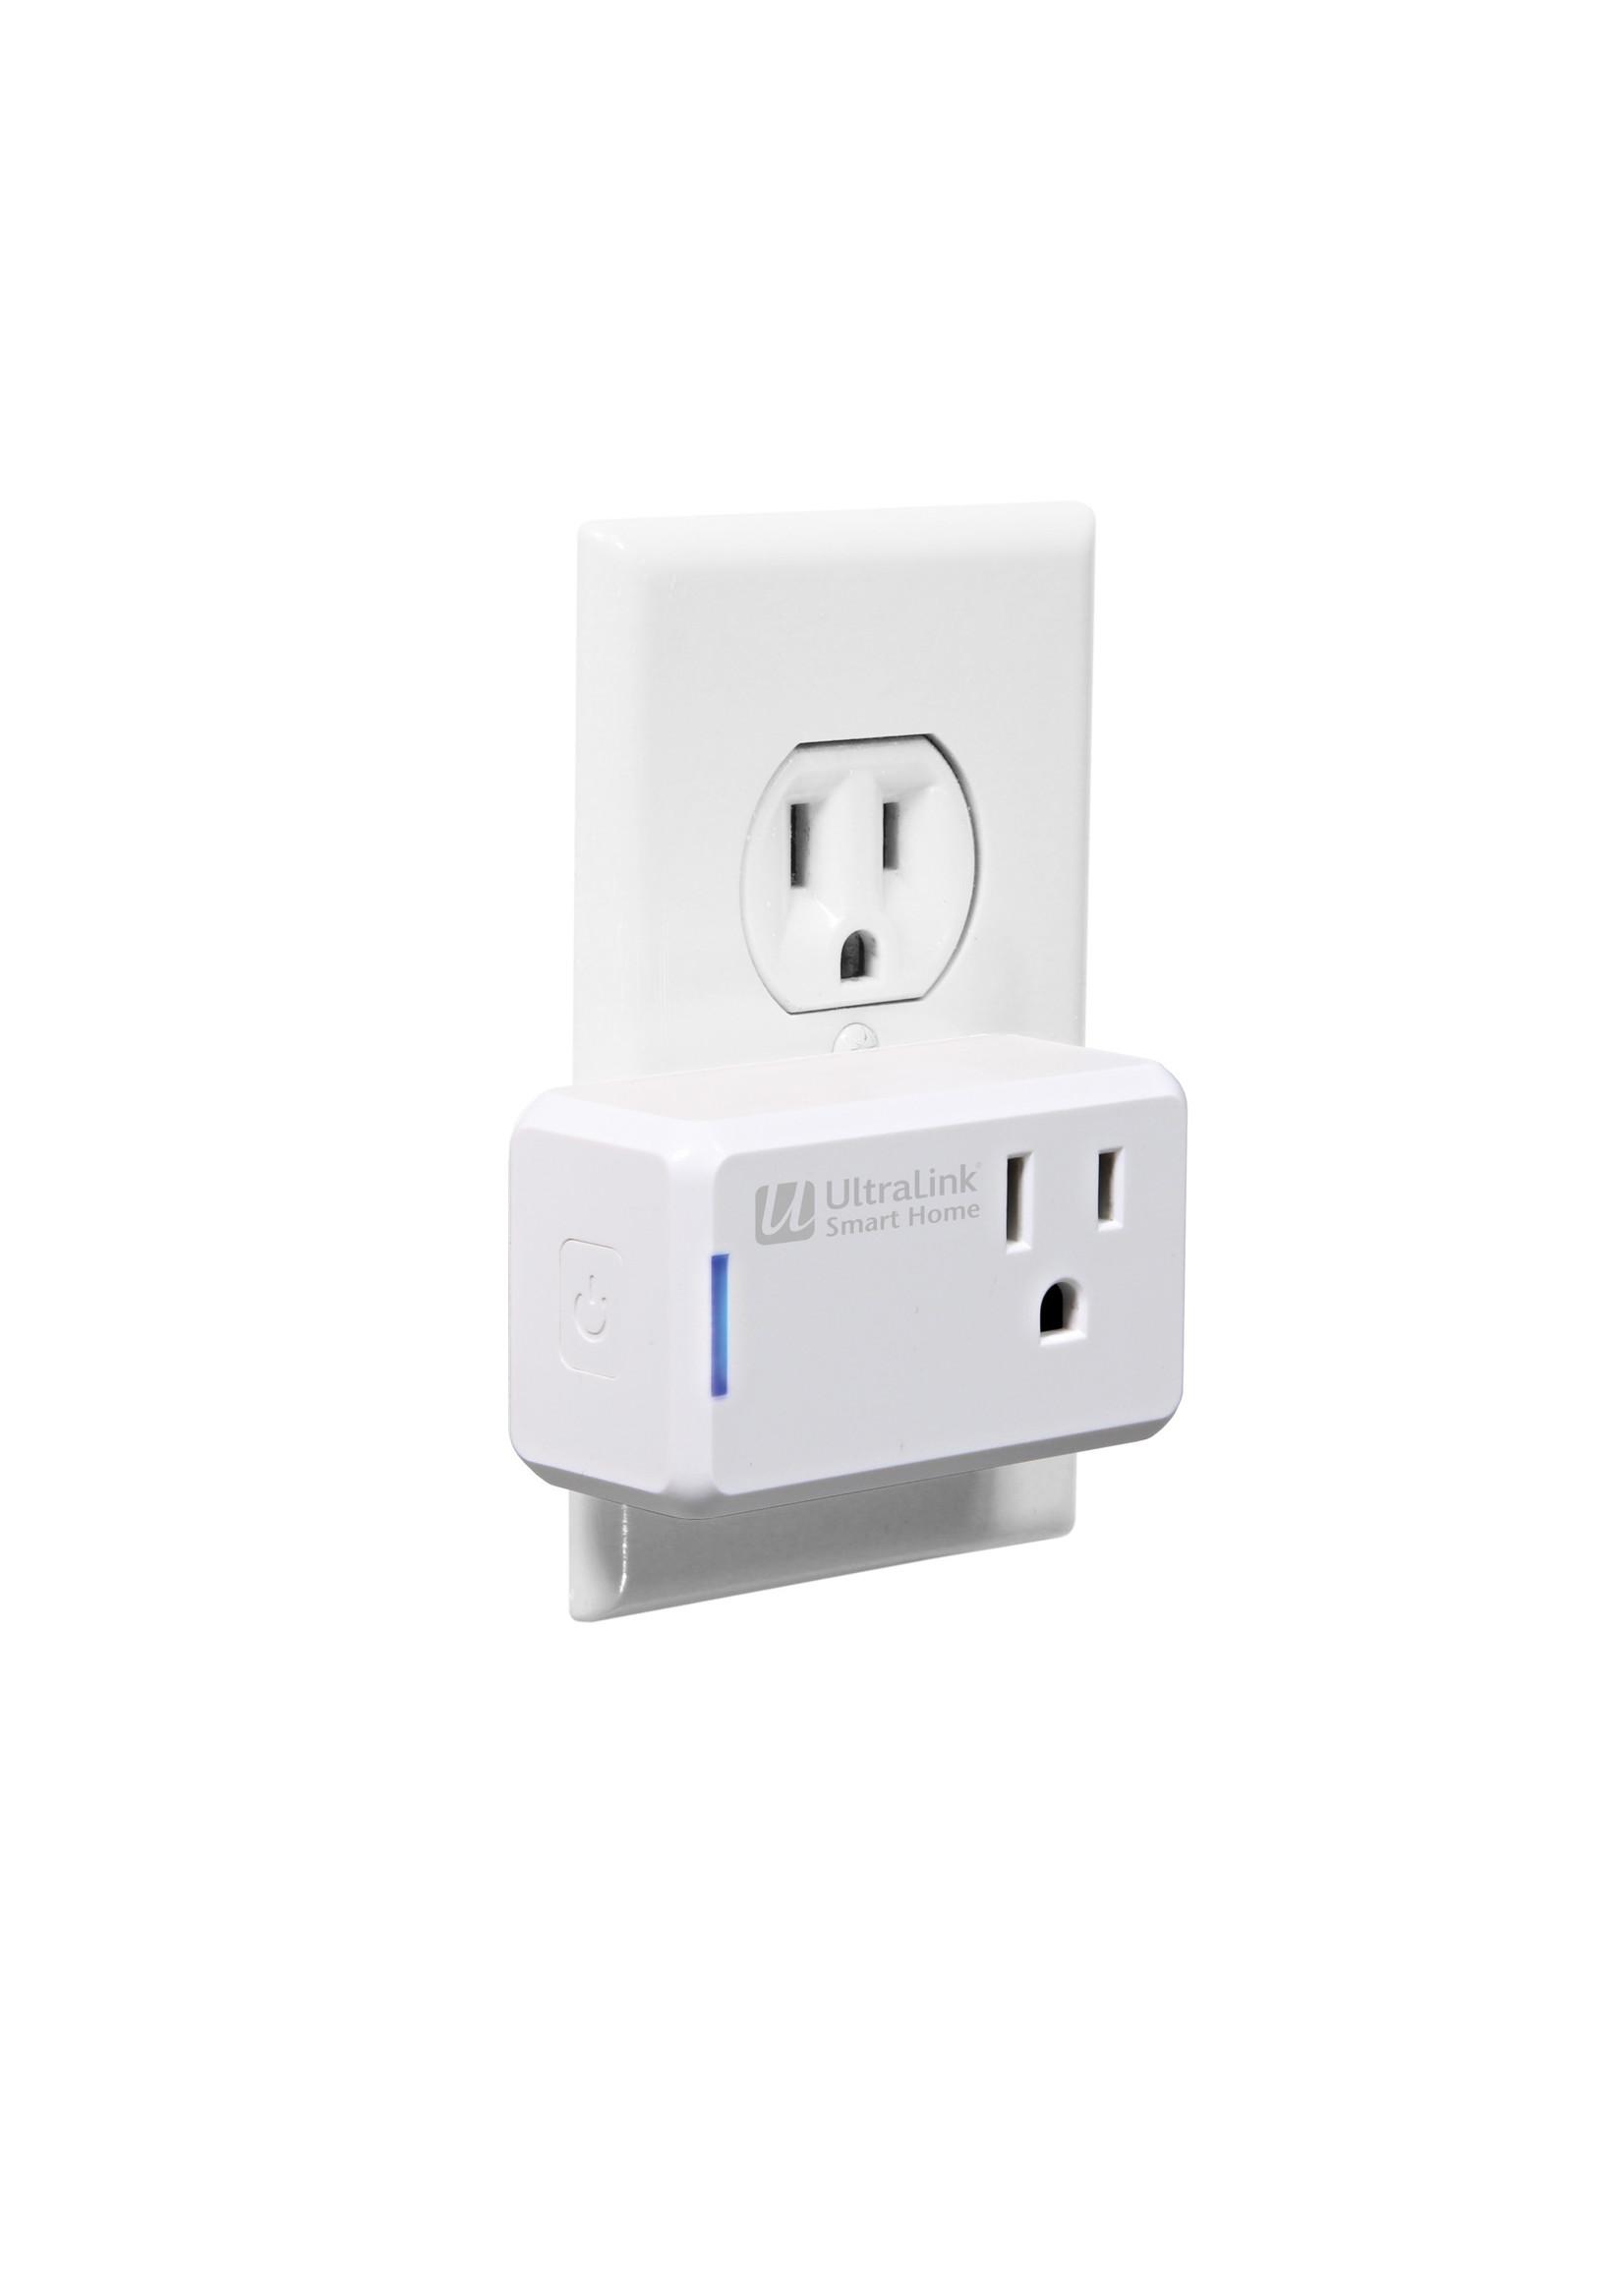 UltraLink ULTRALINK Slim Smart WiFi Plug